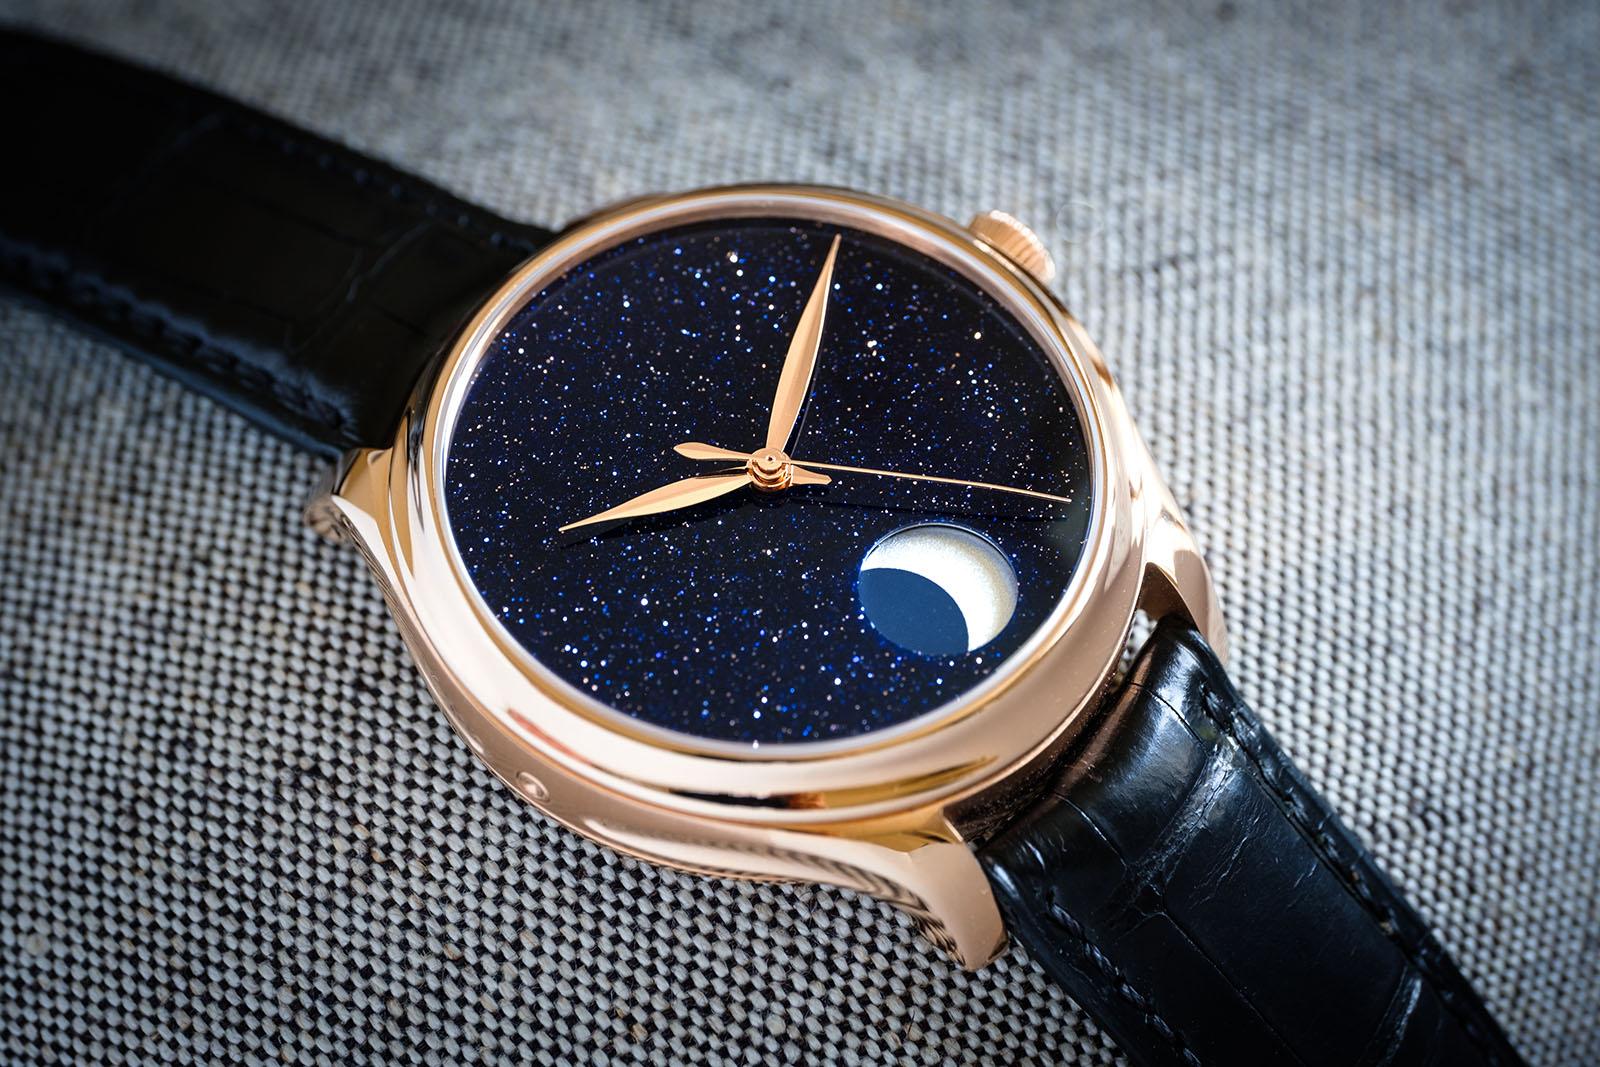 https://watchesbysjx.com/wp-content/uploads/2019/11/H.-Moser-Cie.-Endeavour-Perpetual-Moon-Concept-Aventurine.jpg